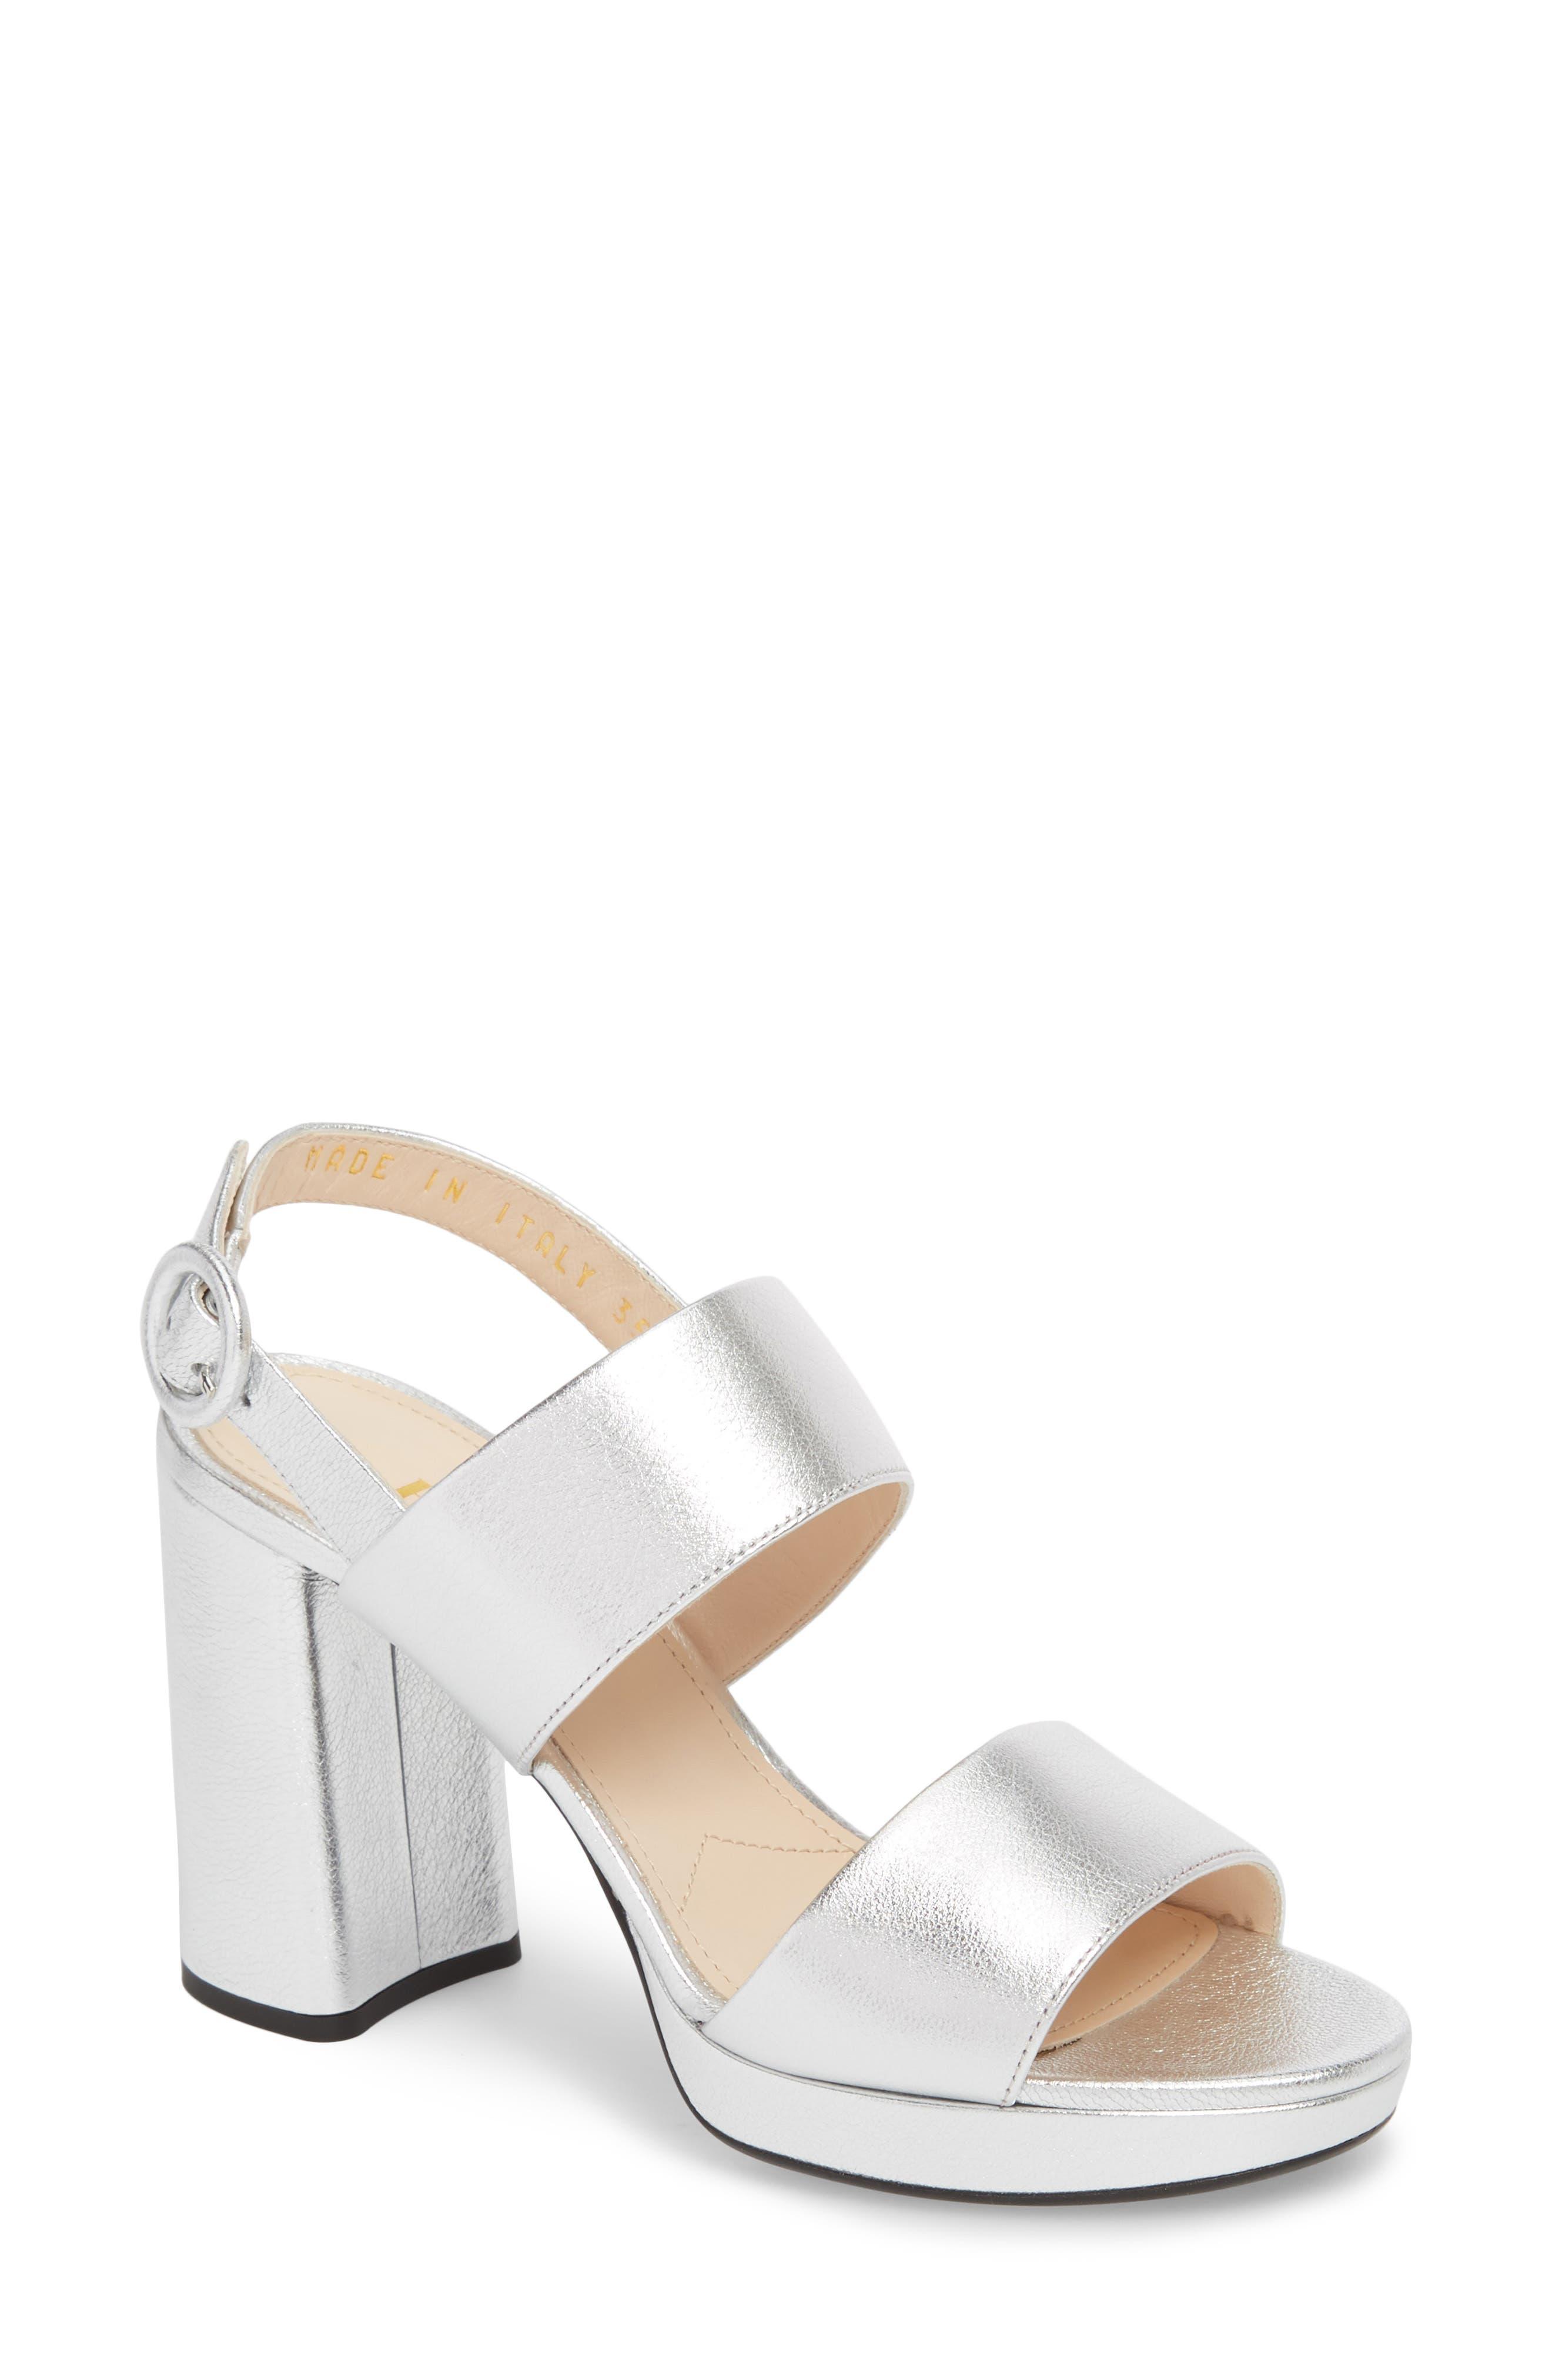 PRADA, Double Band Platform Sandal, Main thumbnail 1, color, SILVER